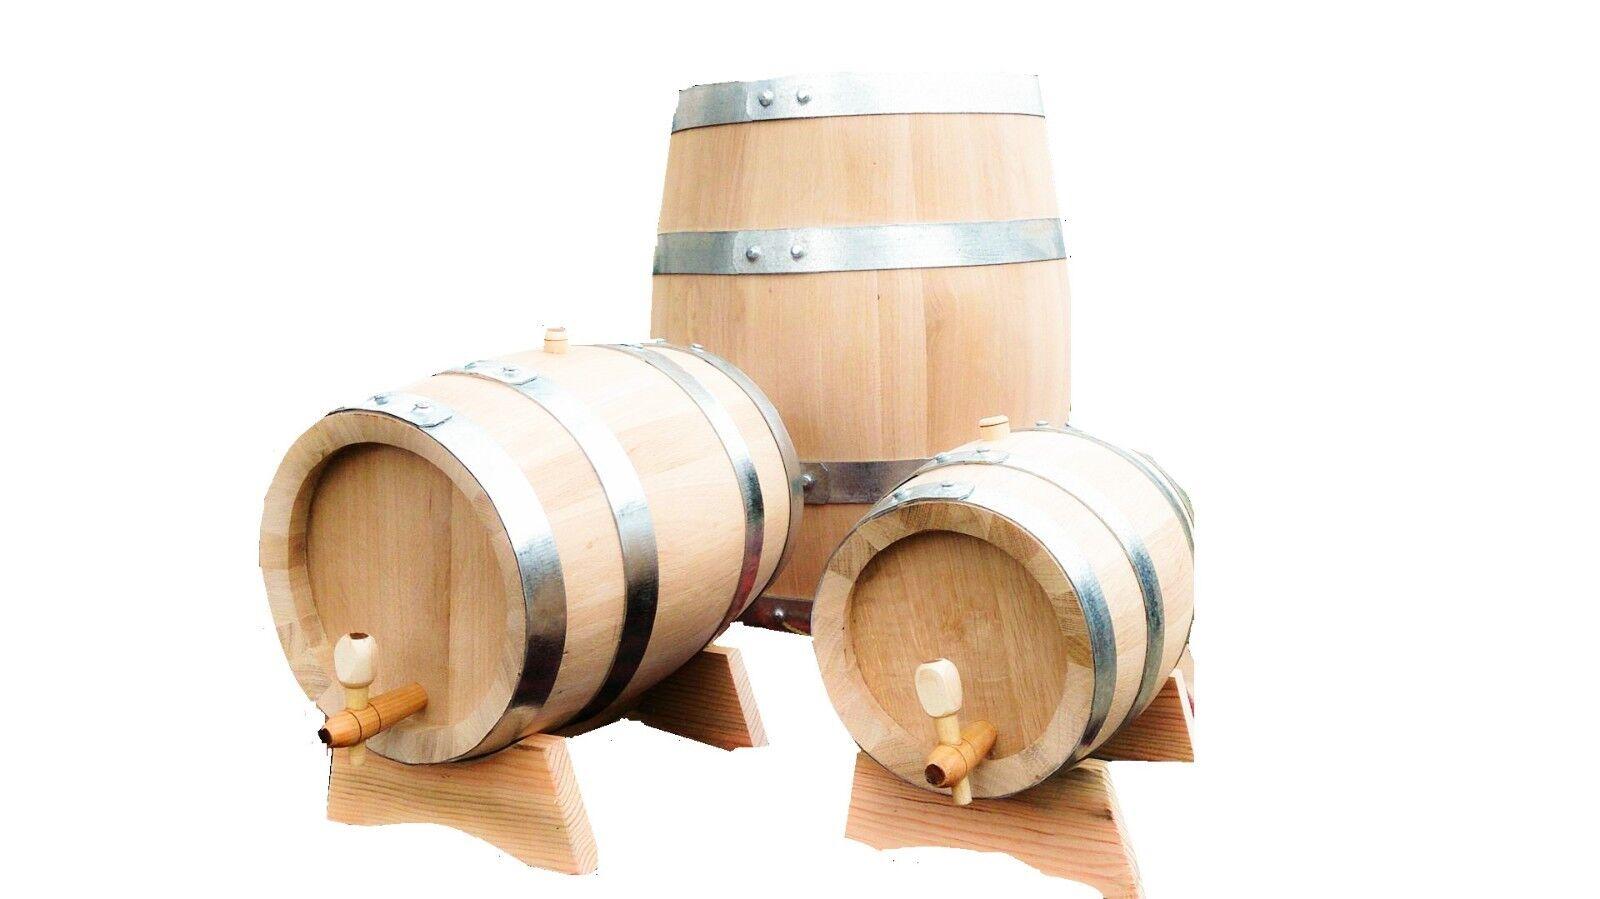 Neuf Chêne en Bois Tonneau, 30l, Vin Whisky, Cidre Eau, Bière